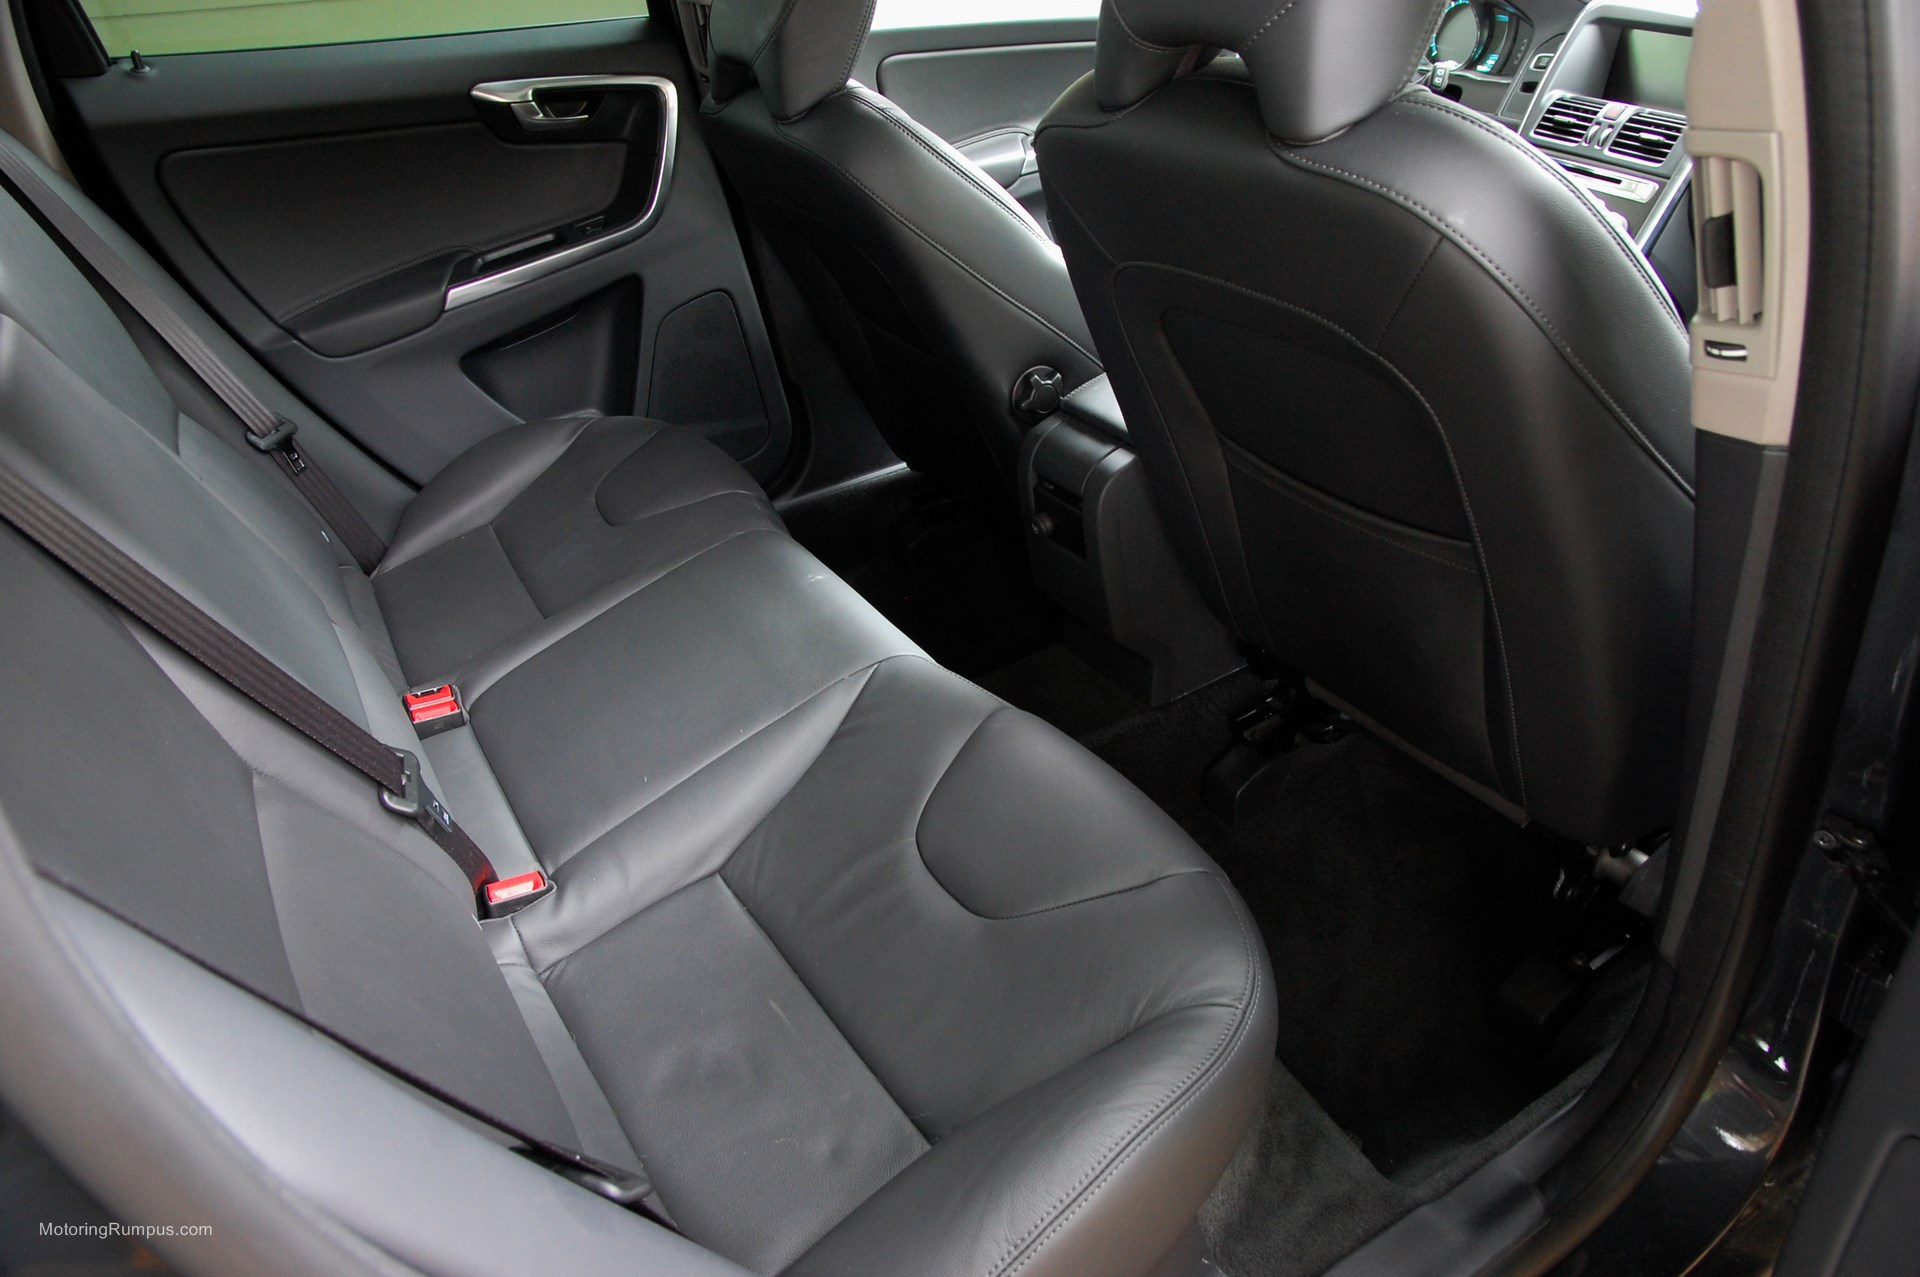 2015 Volvo XC60 Rear Legroom